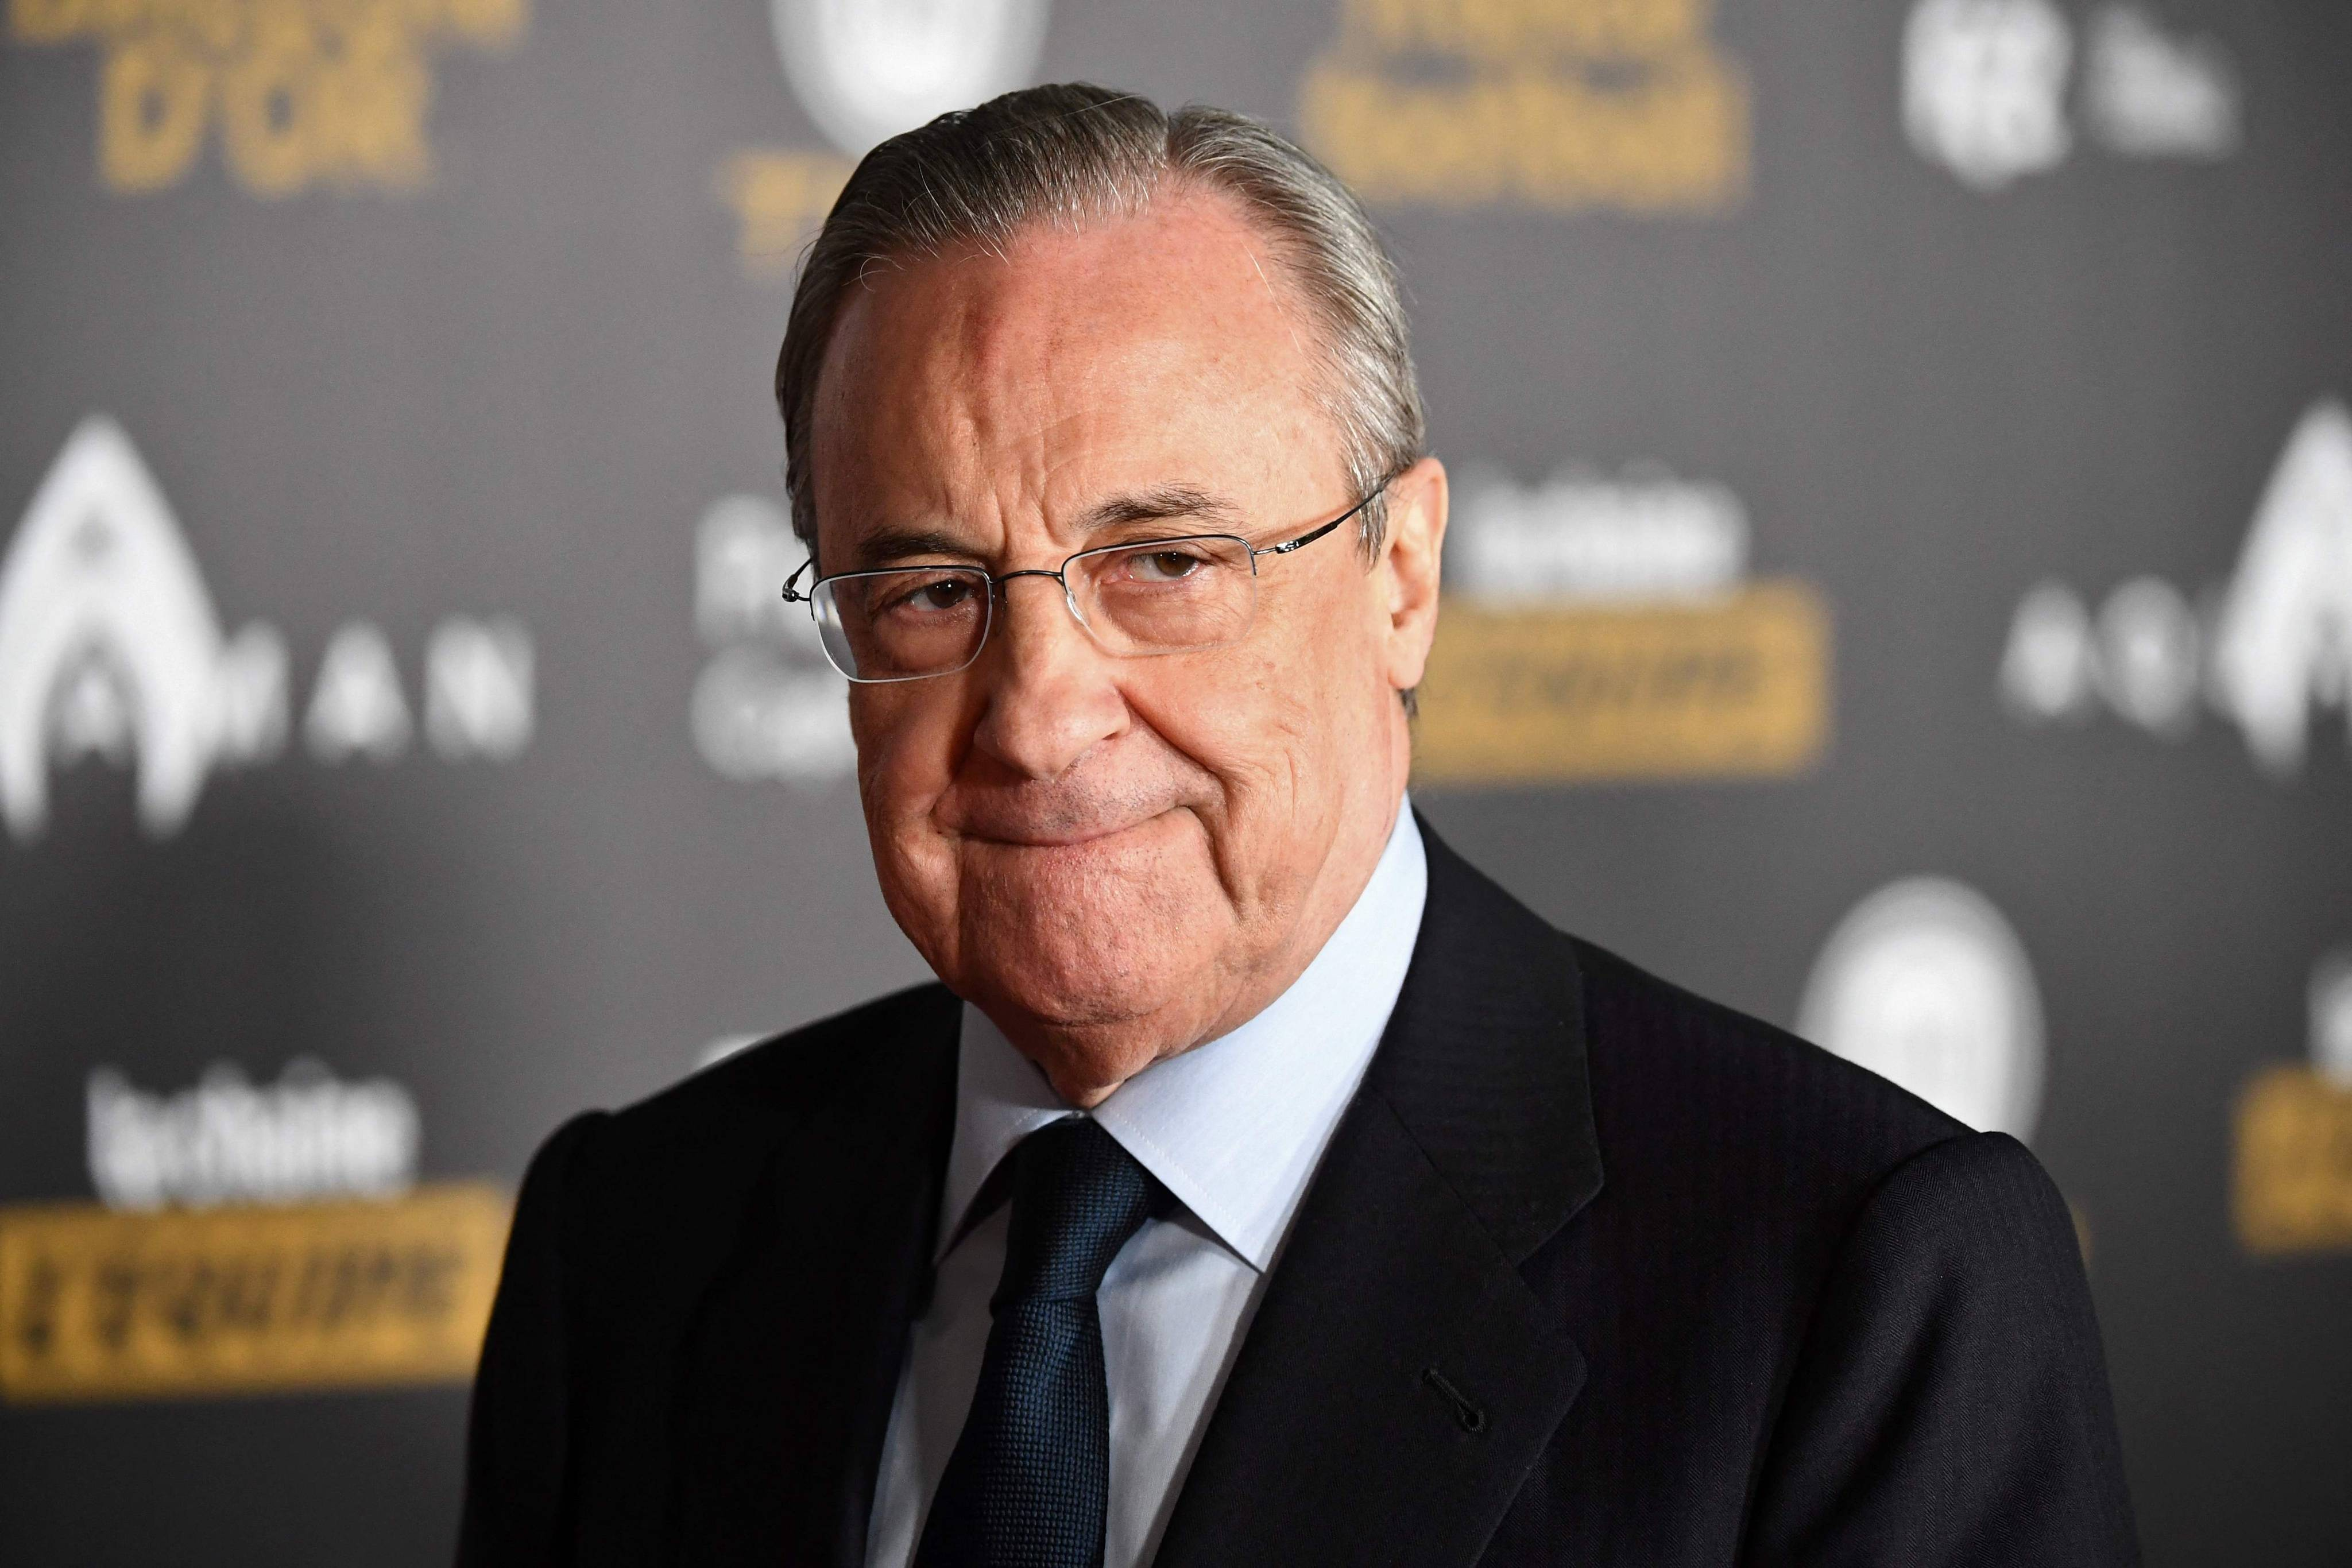 Le président du Real Madrid, Florentino Perez en 2018 (illustration).